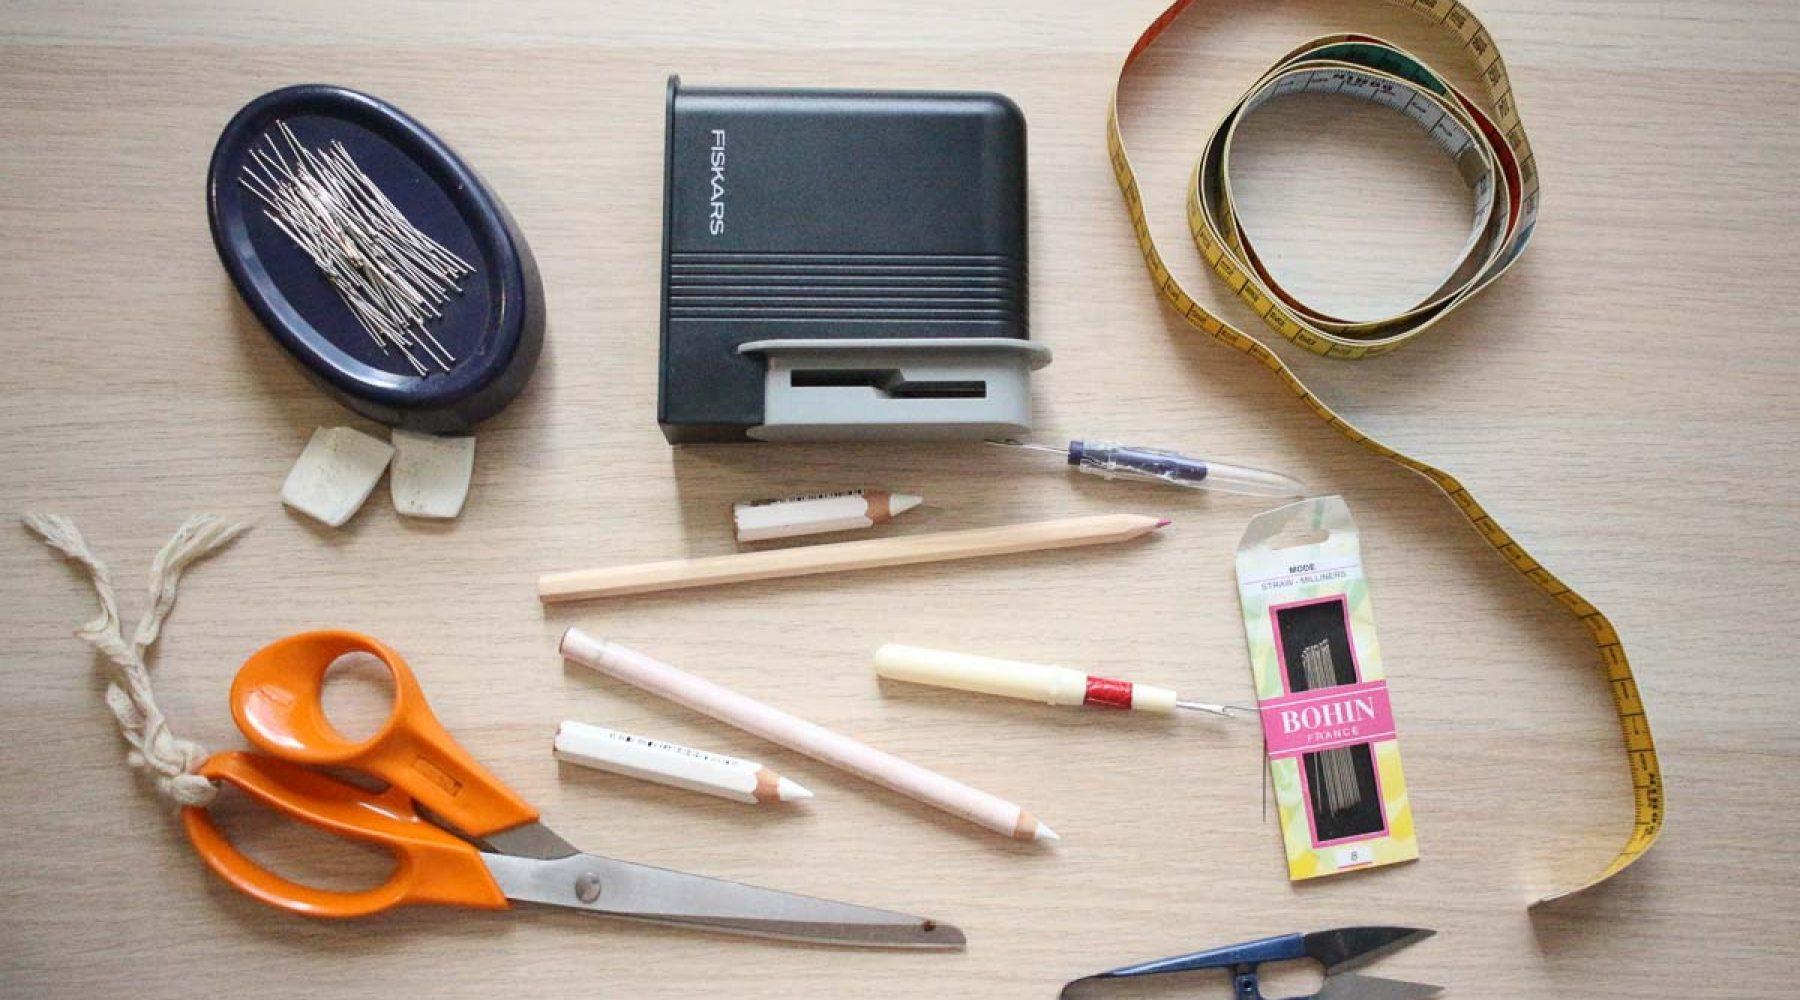 Pause Moderne -Box creative et gourmande Article blog -Materiel couture diy